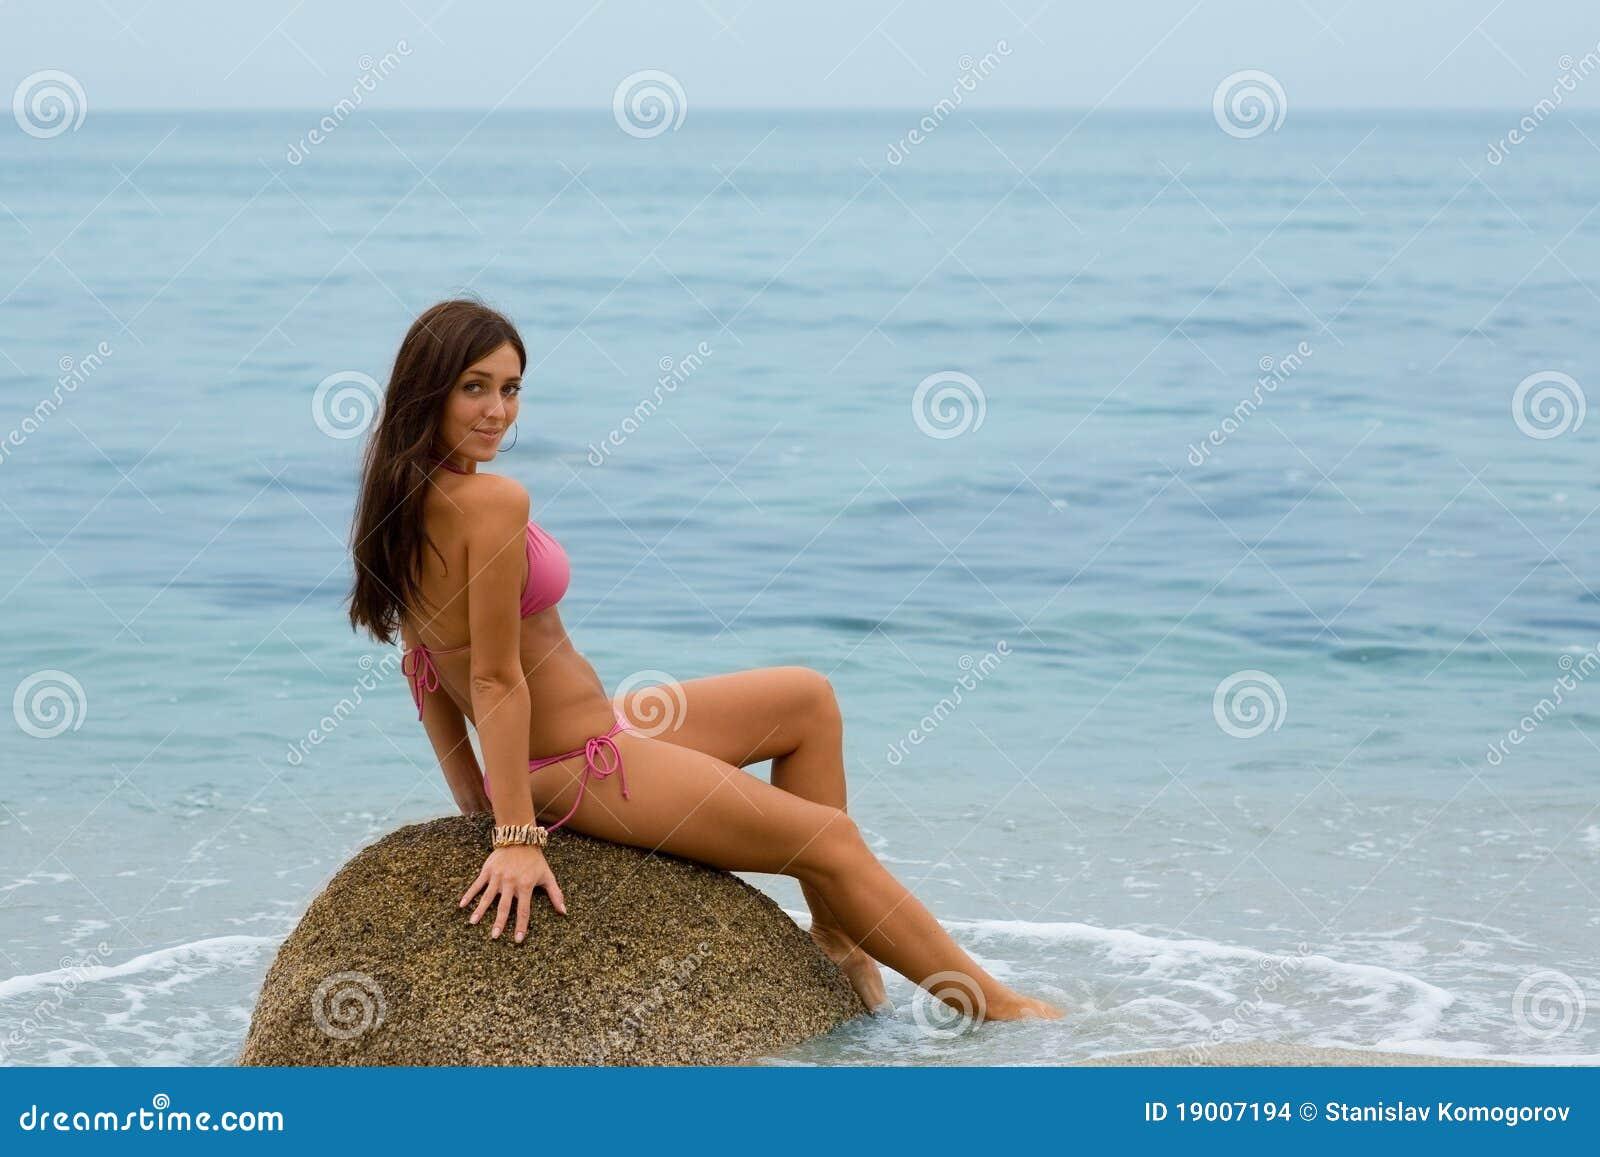 Girl sitting on rock must